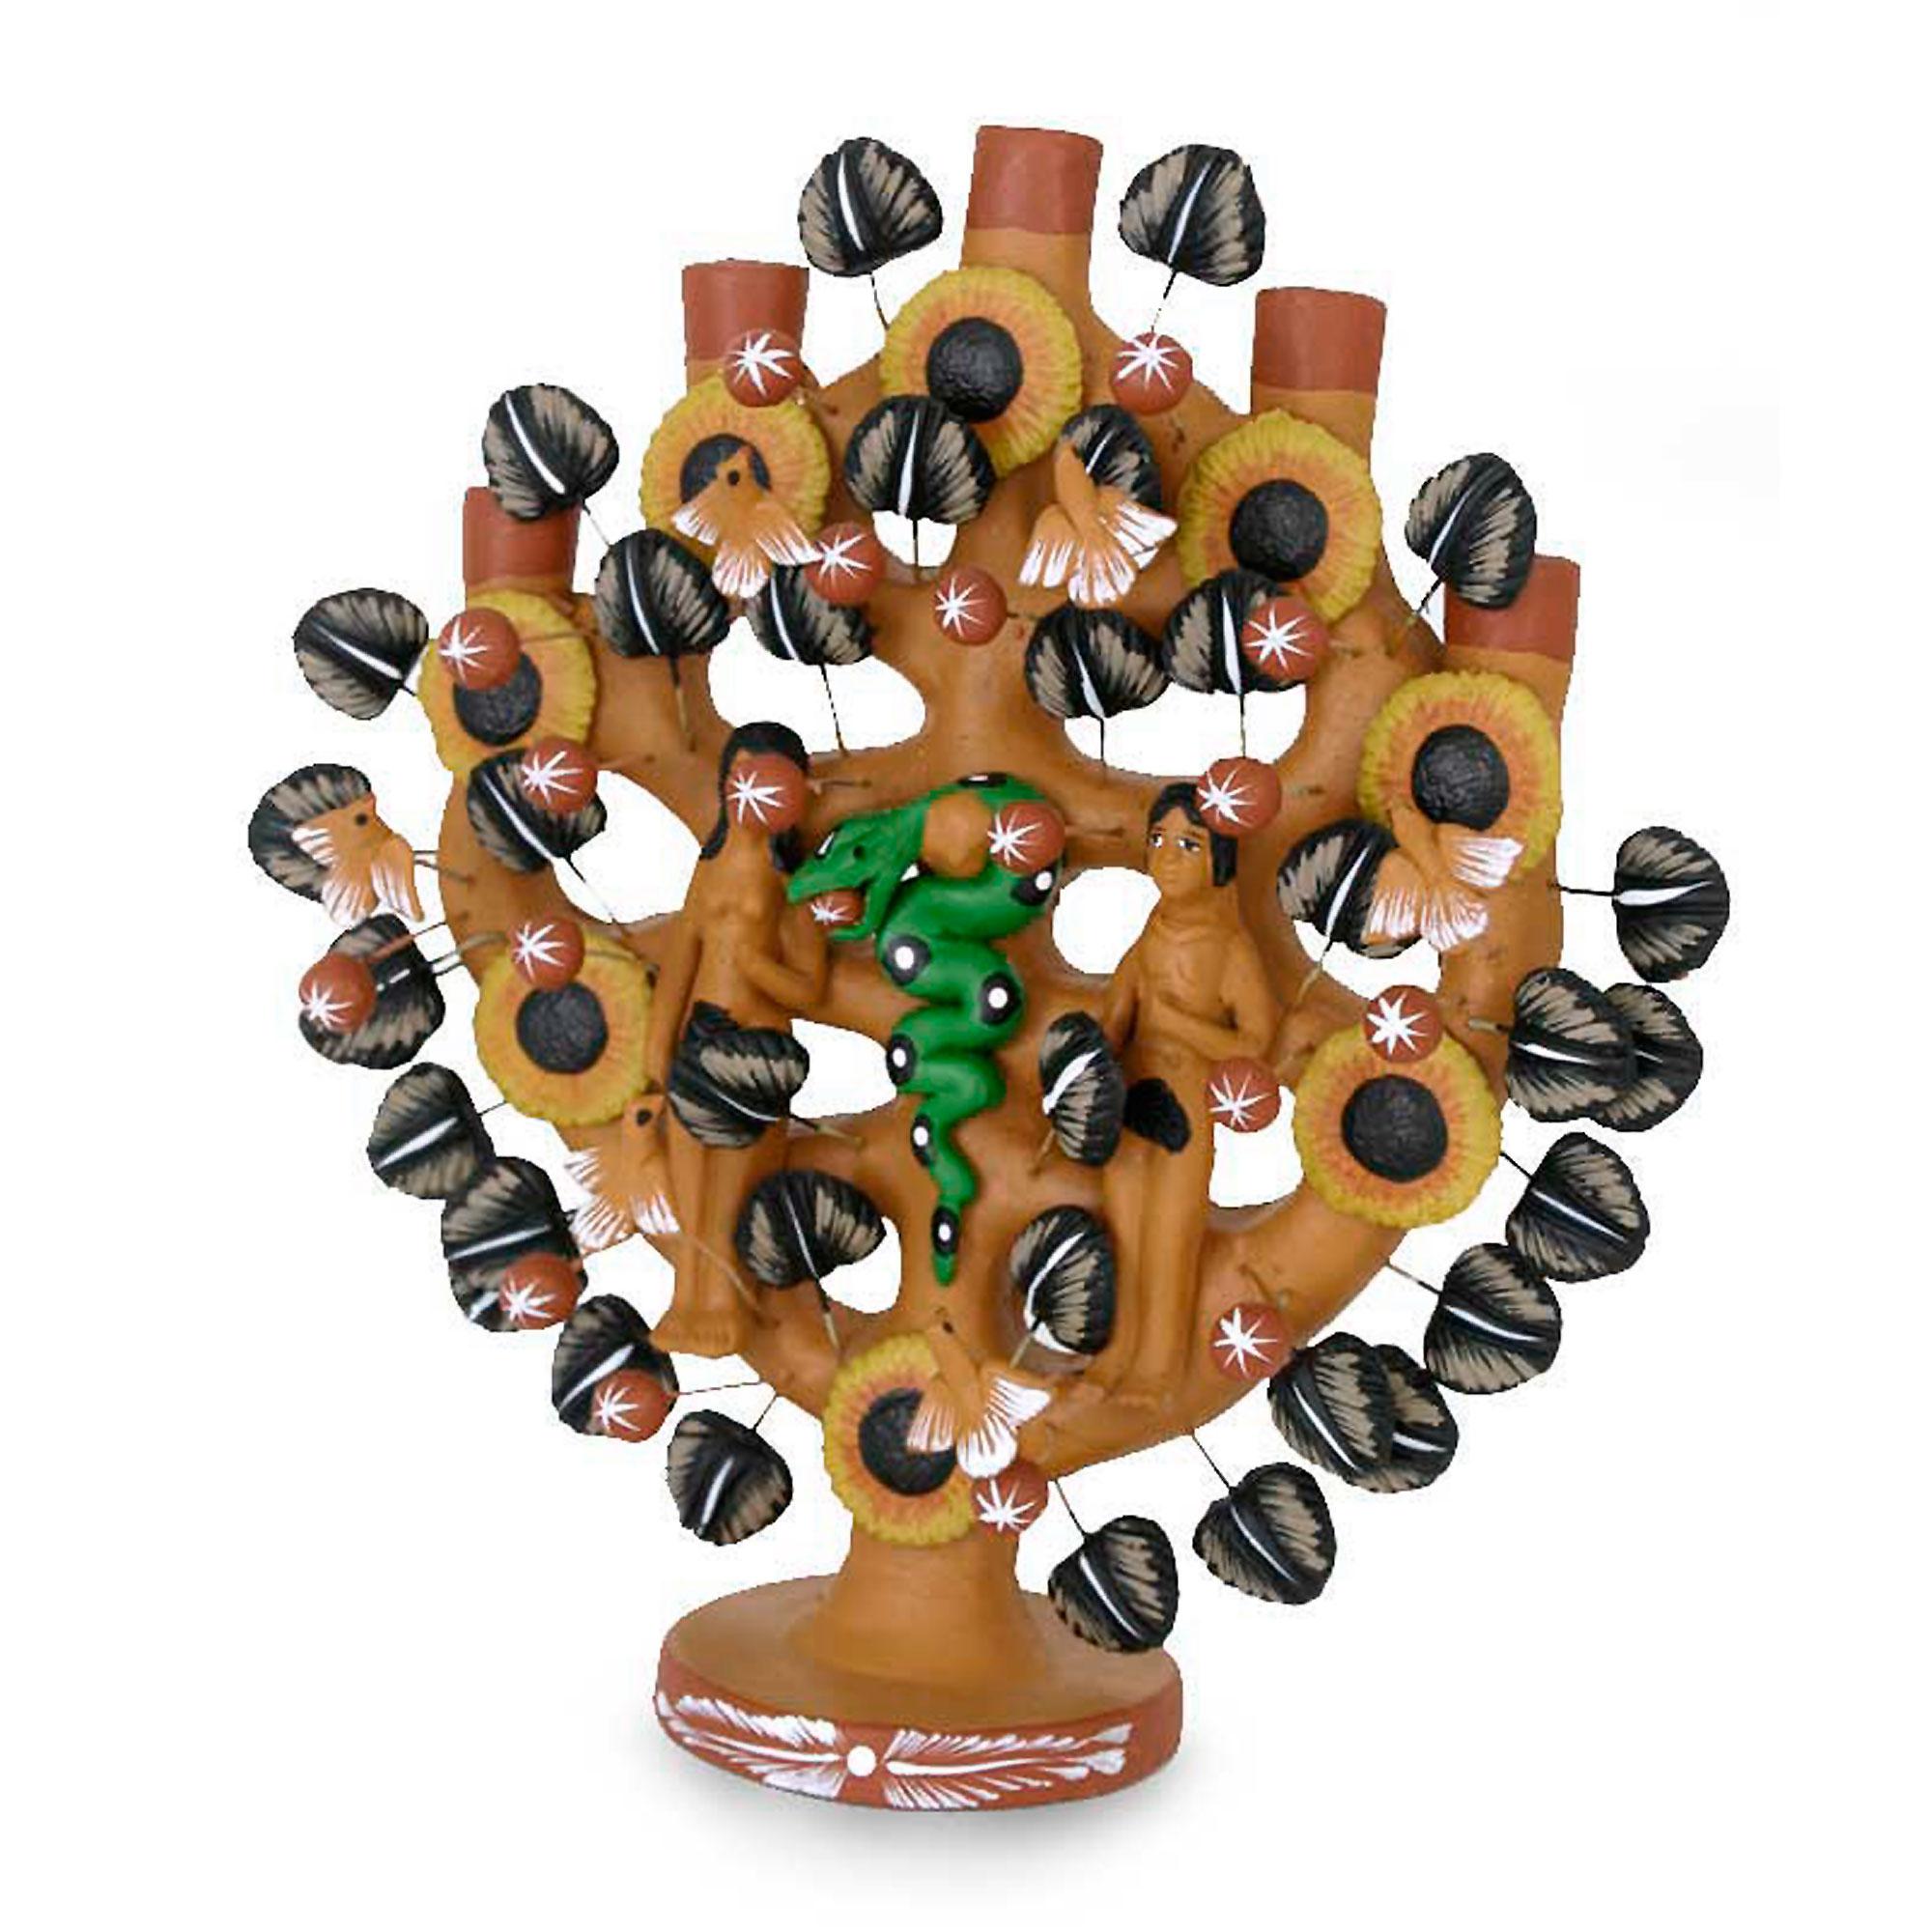 mexican folk art hand crafted religious ceramic sculpture adam